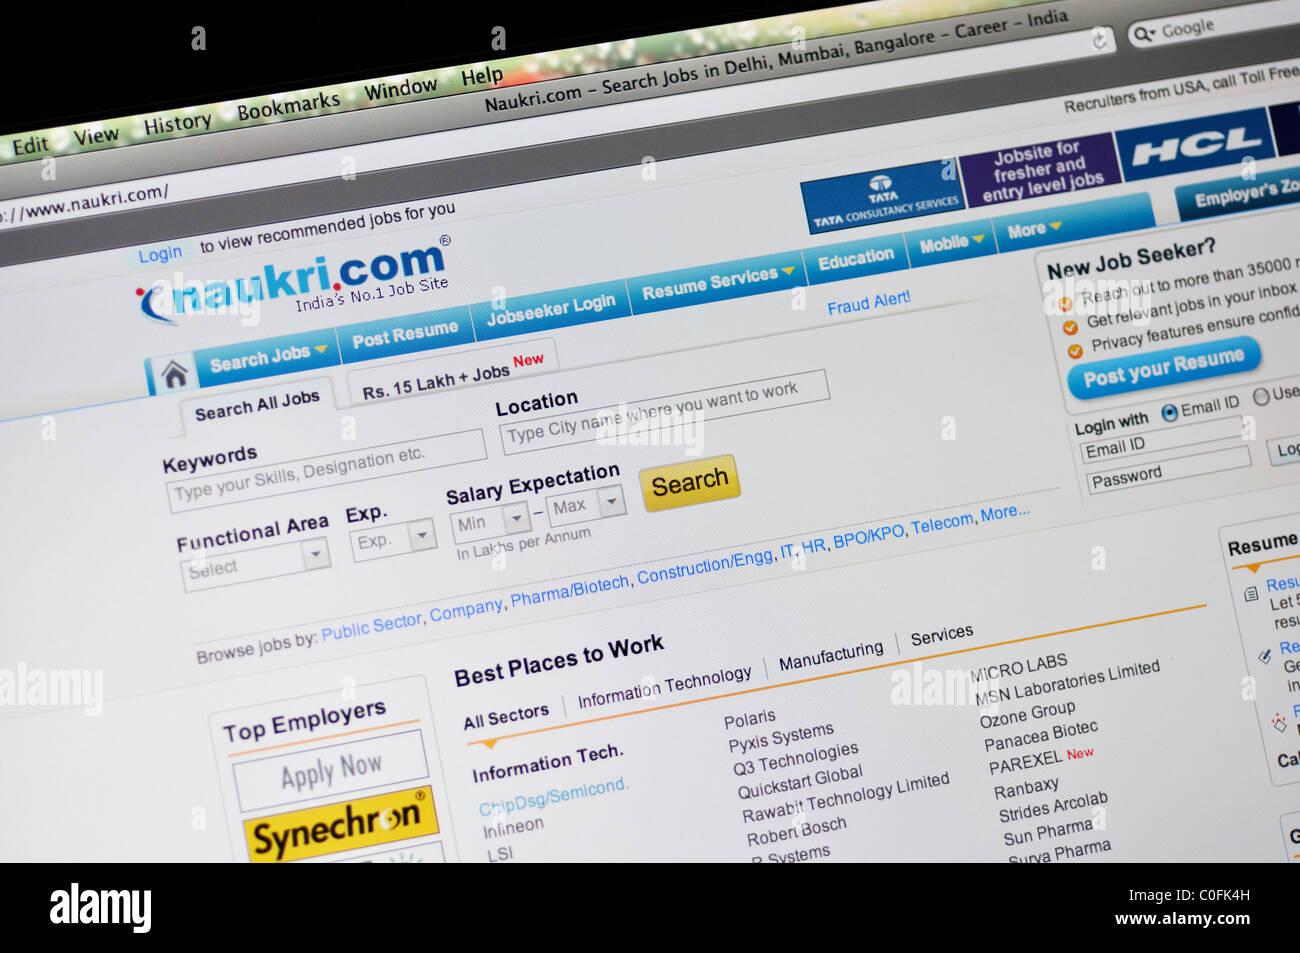 Naukri - Indian job search website Stock Photo: 34765041 - Alamy